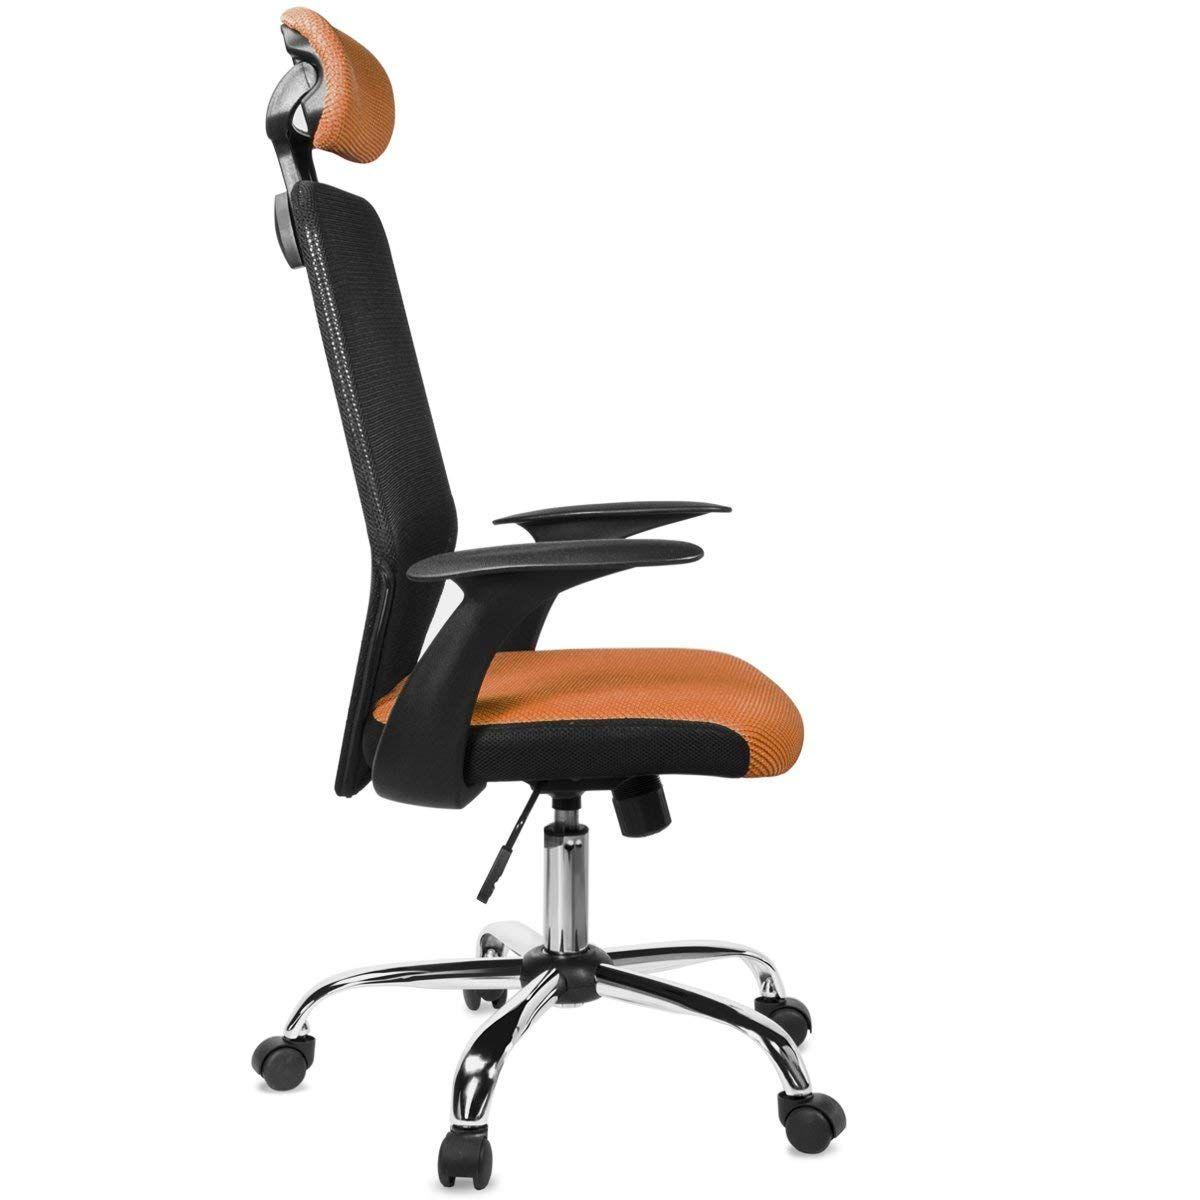 Barton mesh office desk chair w headrest orange chair